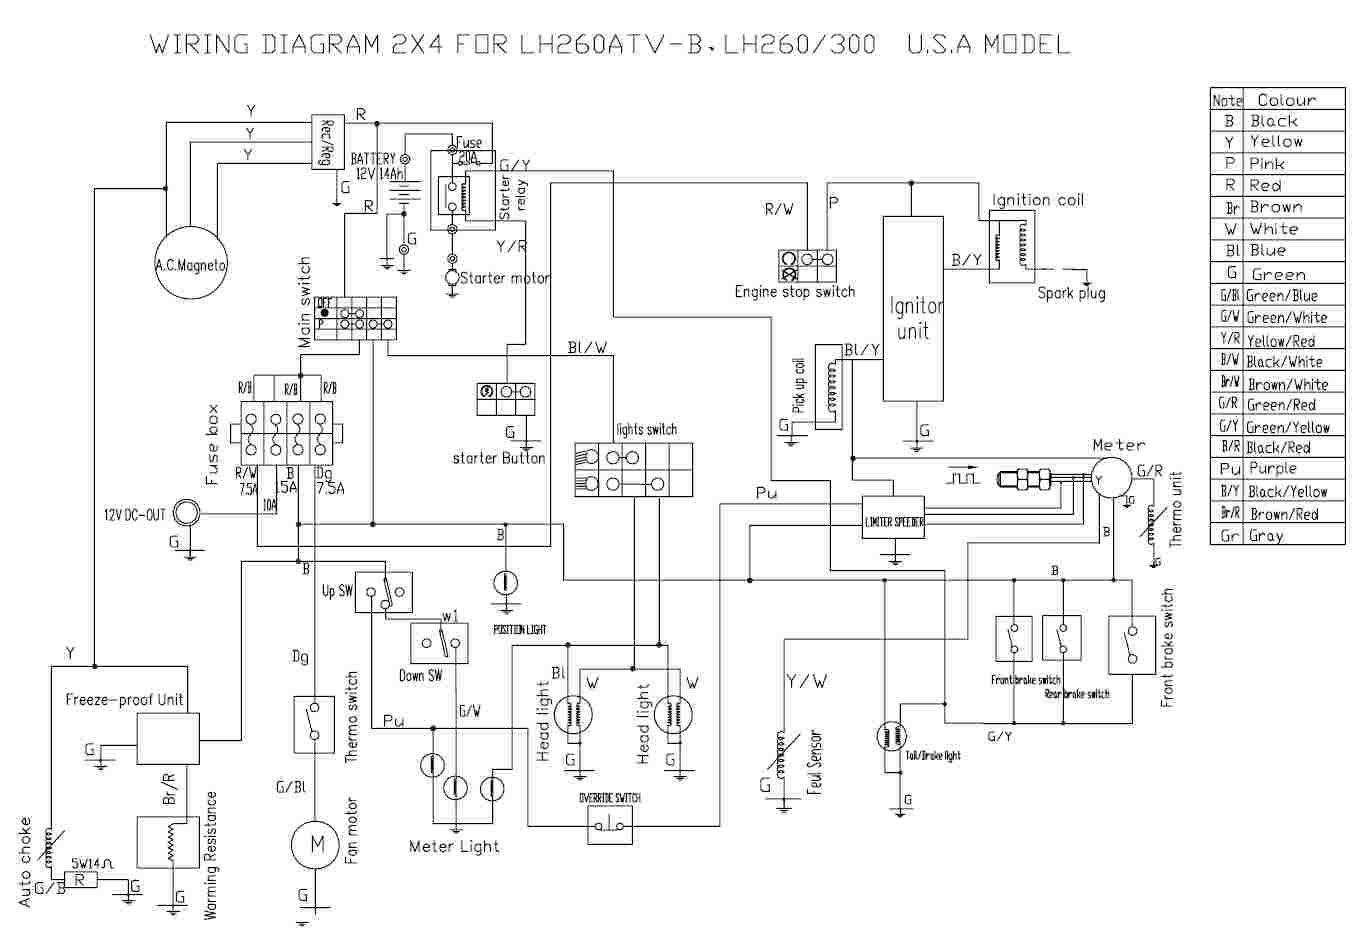 Groovy Wiring Diagrams Atv Baja 250 Linhai 2005 Motorsports Wiring Diagram Wiring Cloud Staixaidewilluminateatxorg